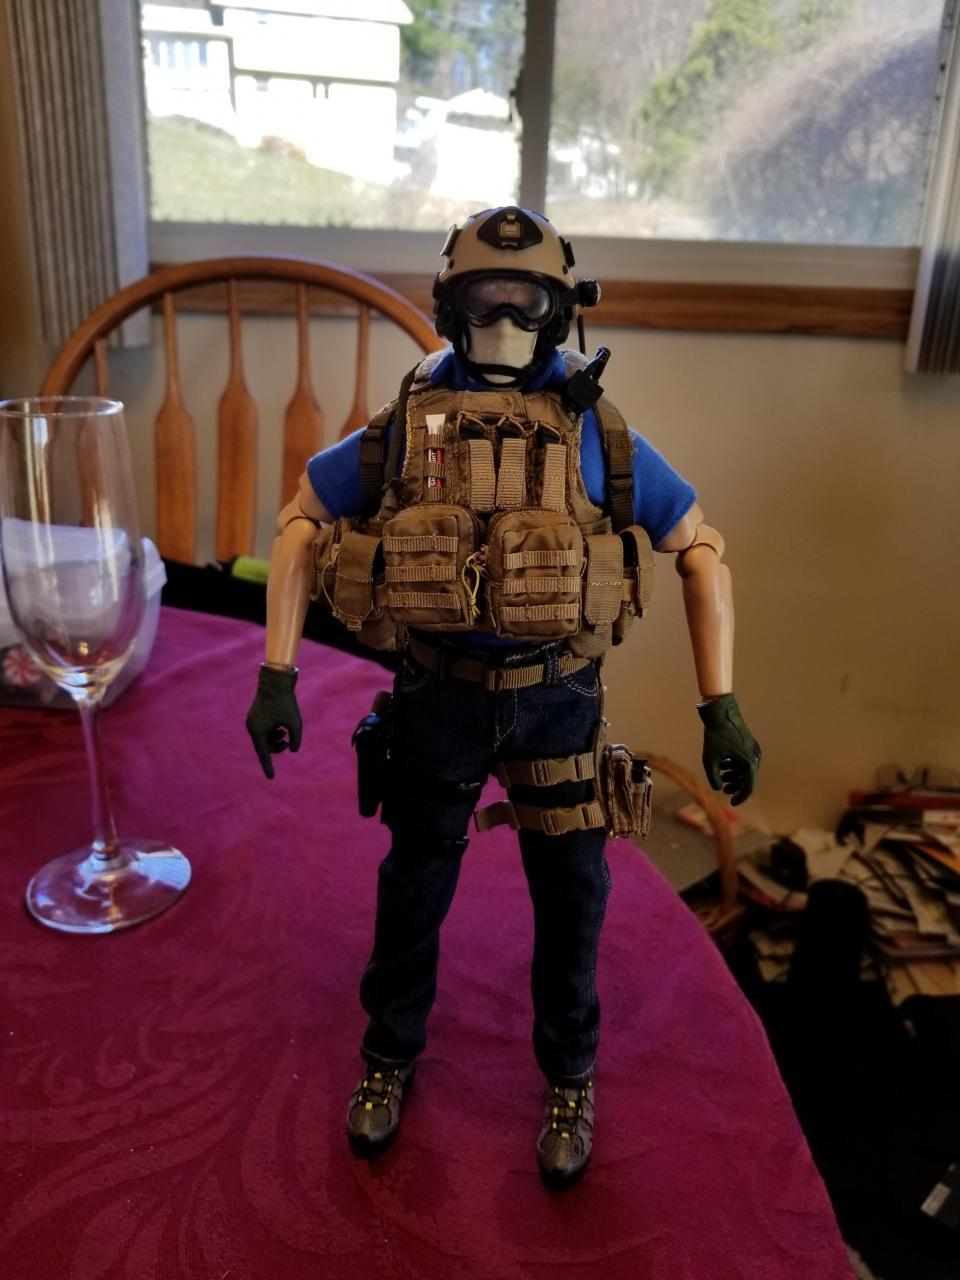 Modern Warfare 2 - Task Force 141 operative in urban wear (pic heavy)-2_-_cowdj7q[1]-jpg